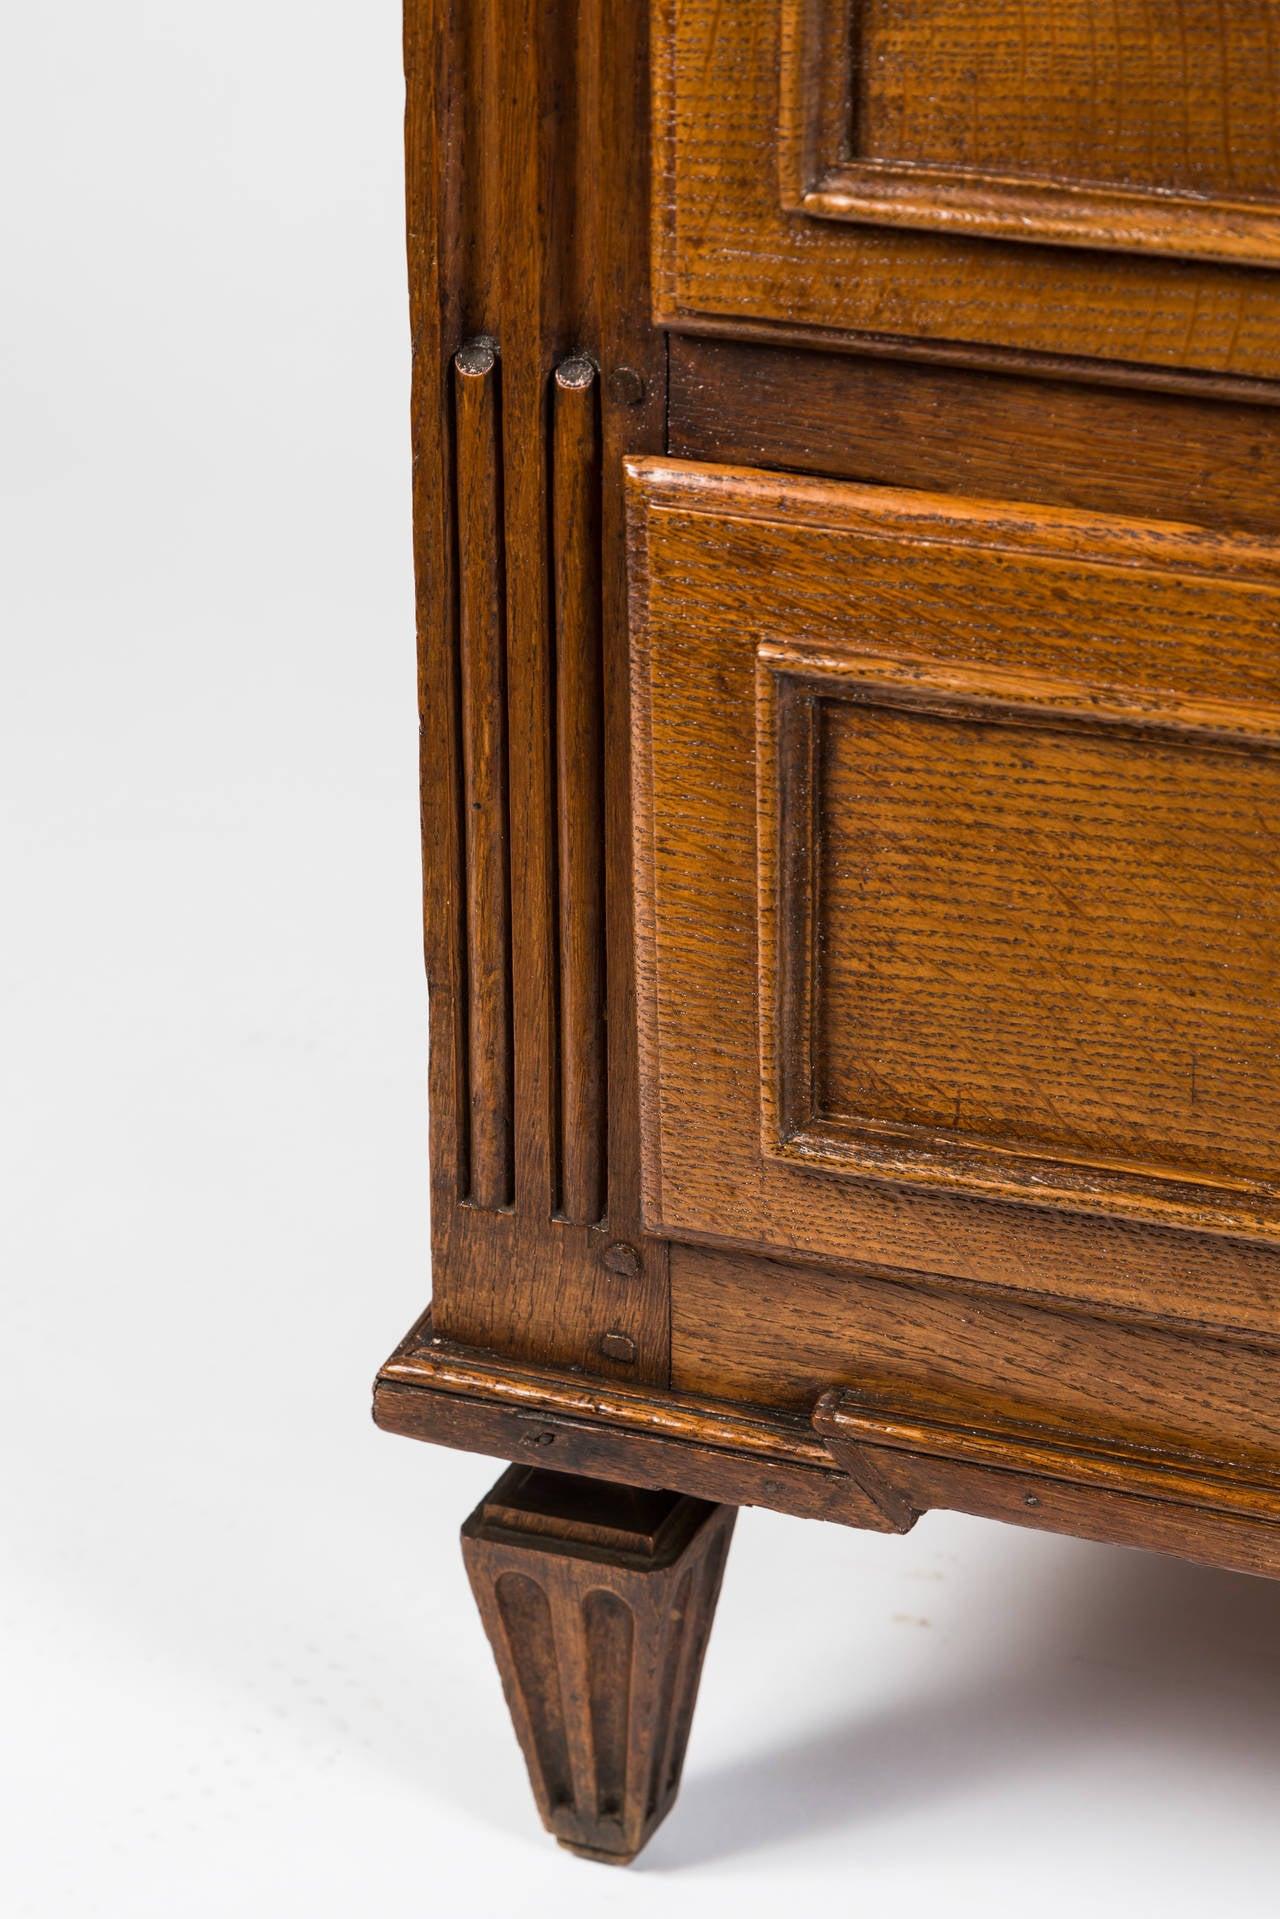 18th Century French Louis XVI Dresser in Solid Oak 7